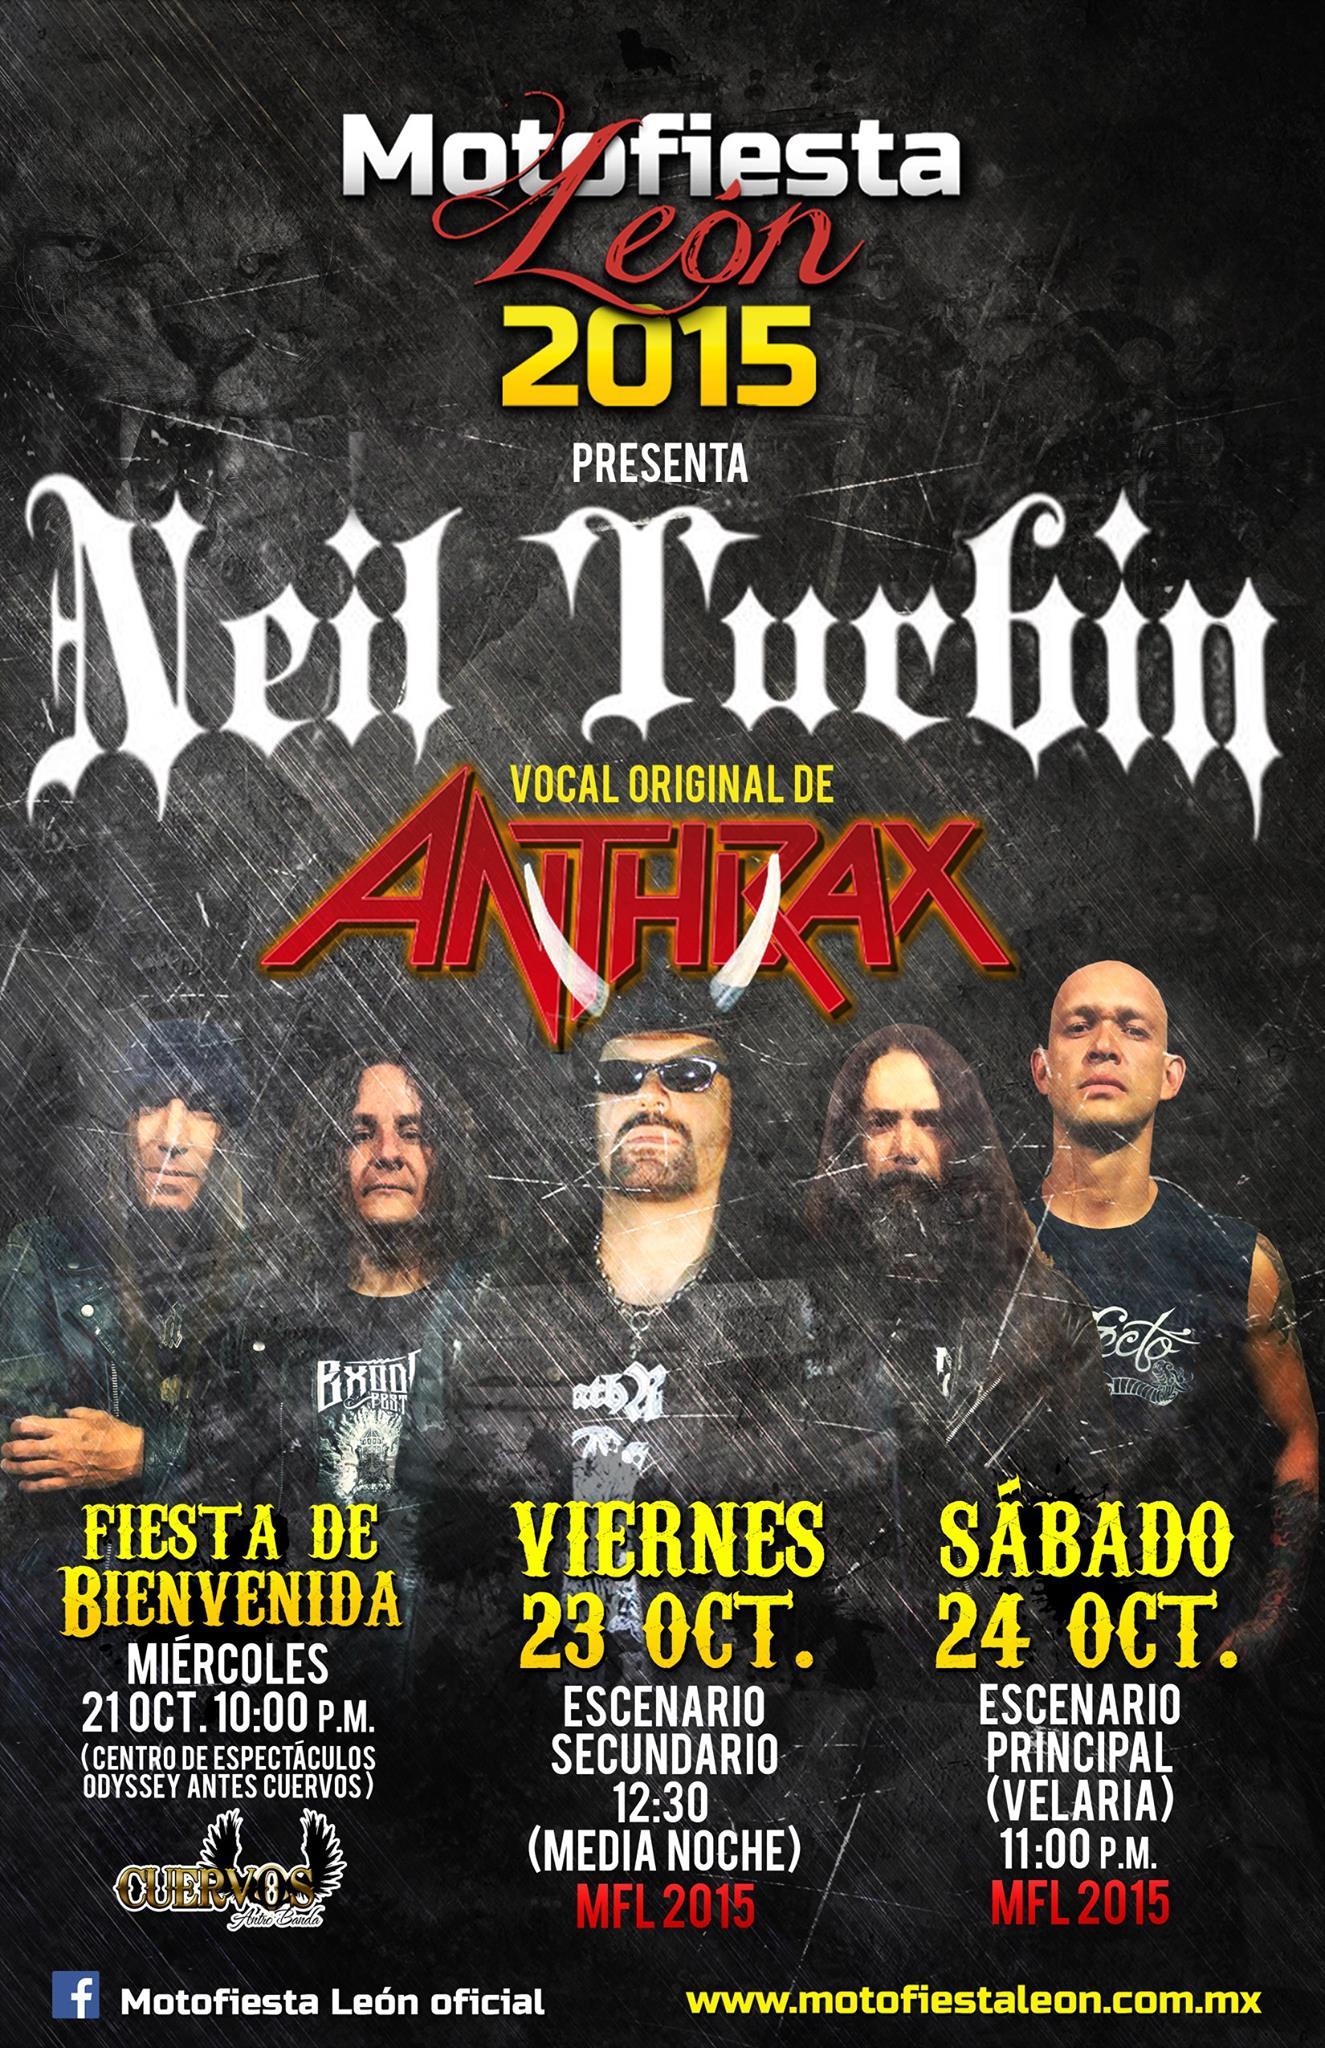 Neil Turbin live Motofiesta Leon 9/24/2015